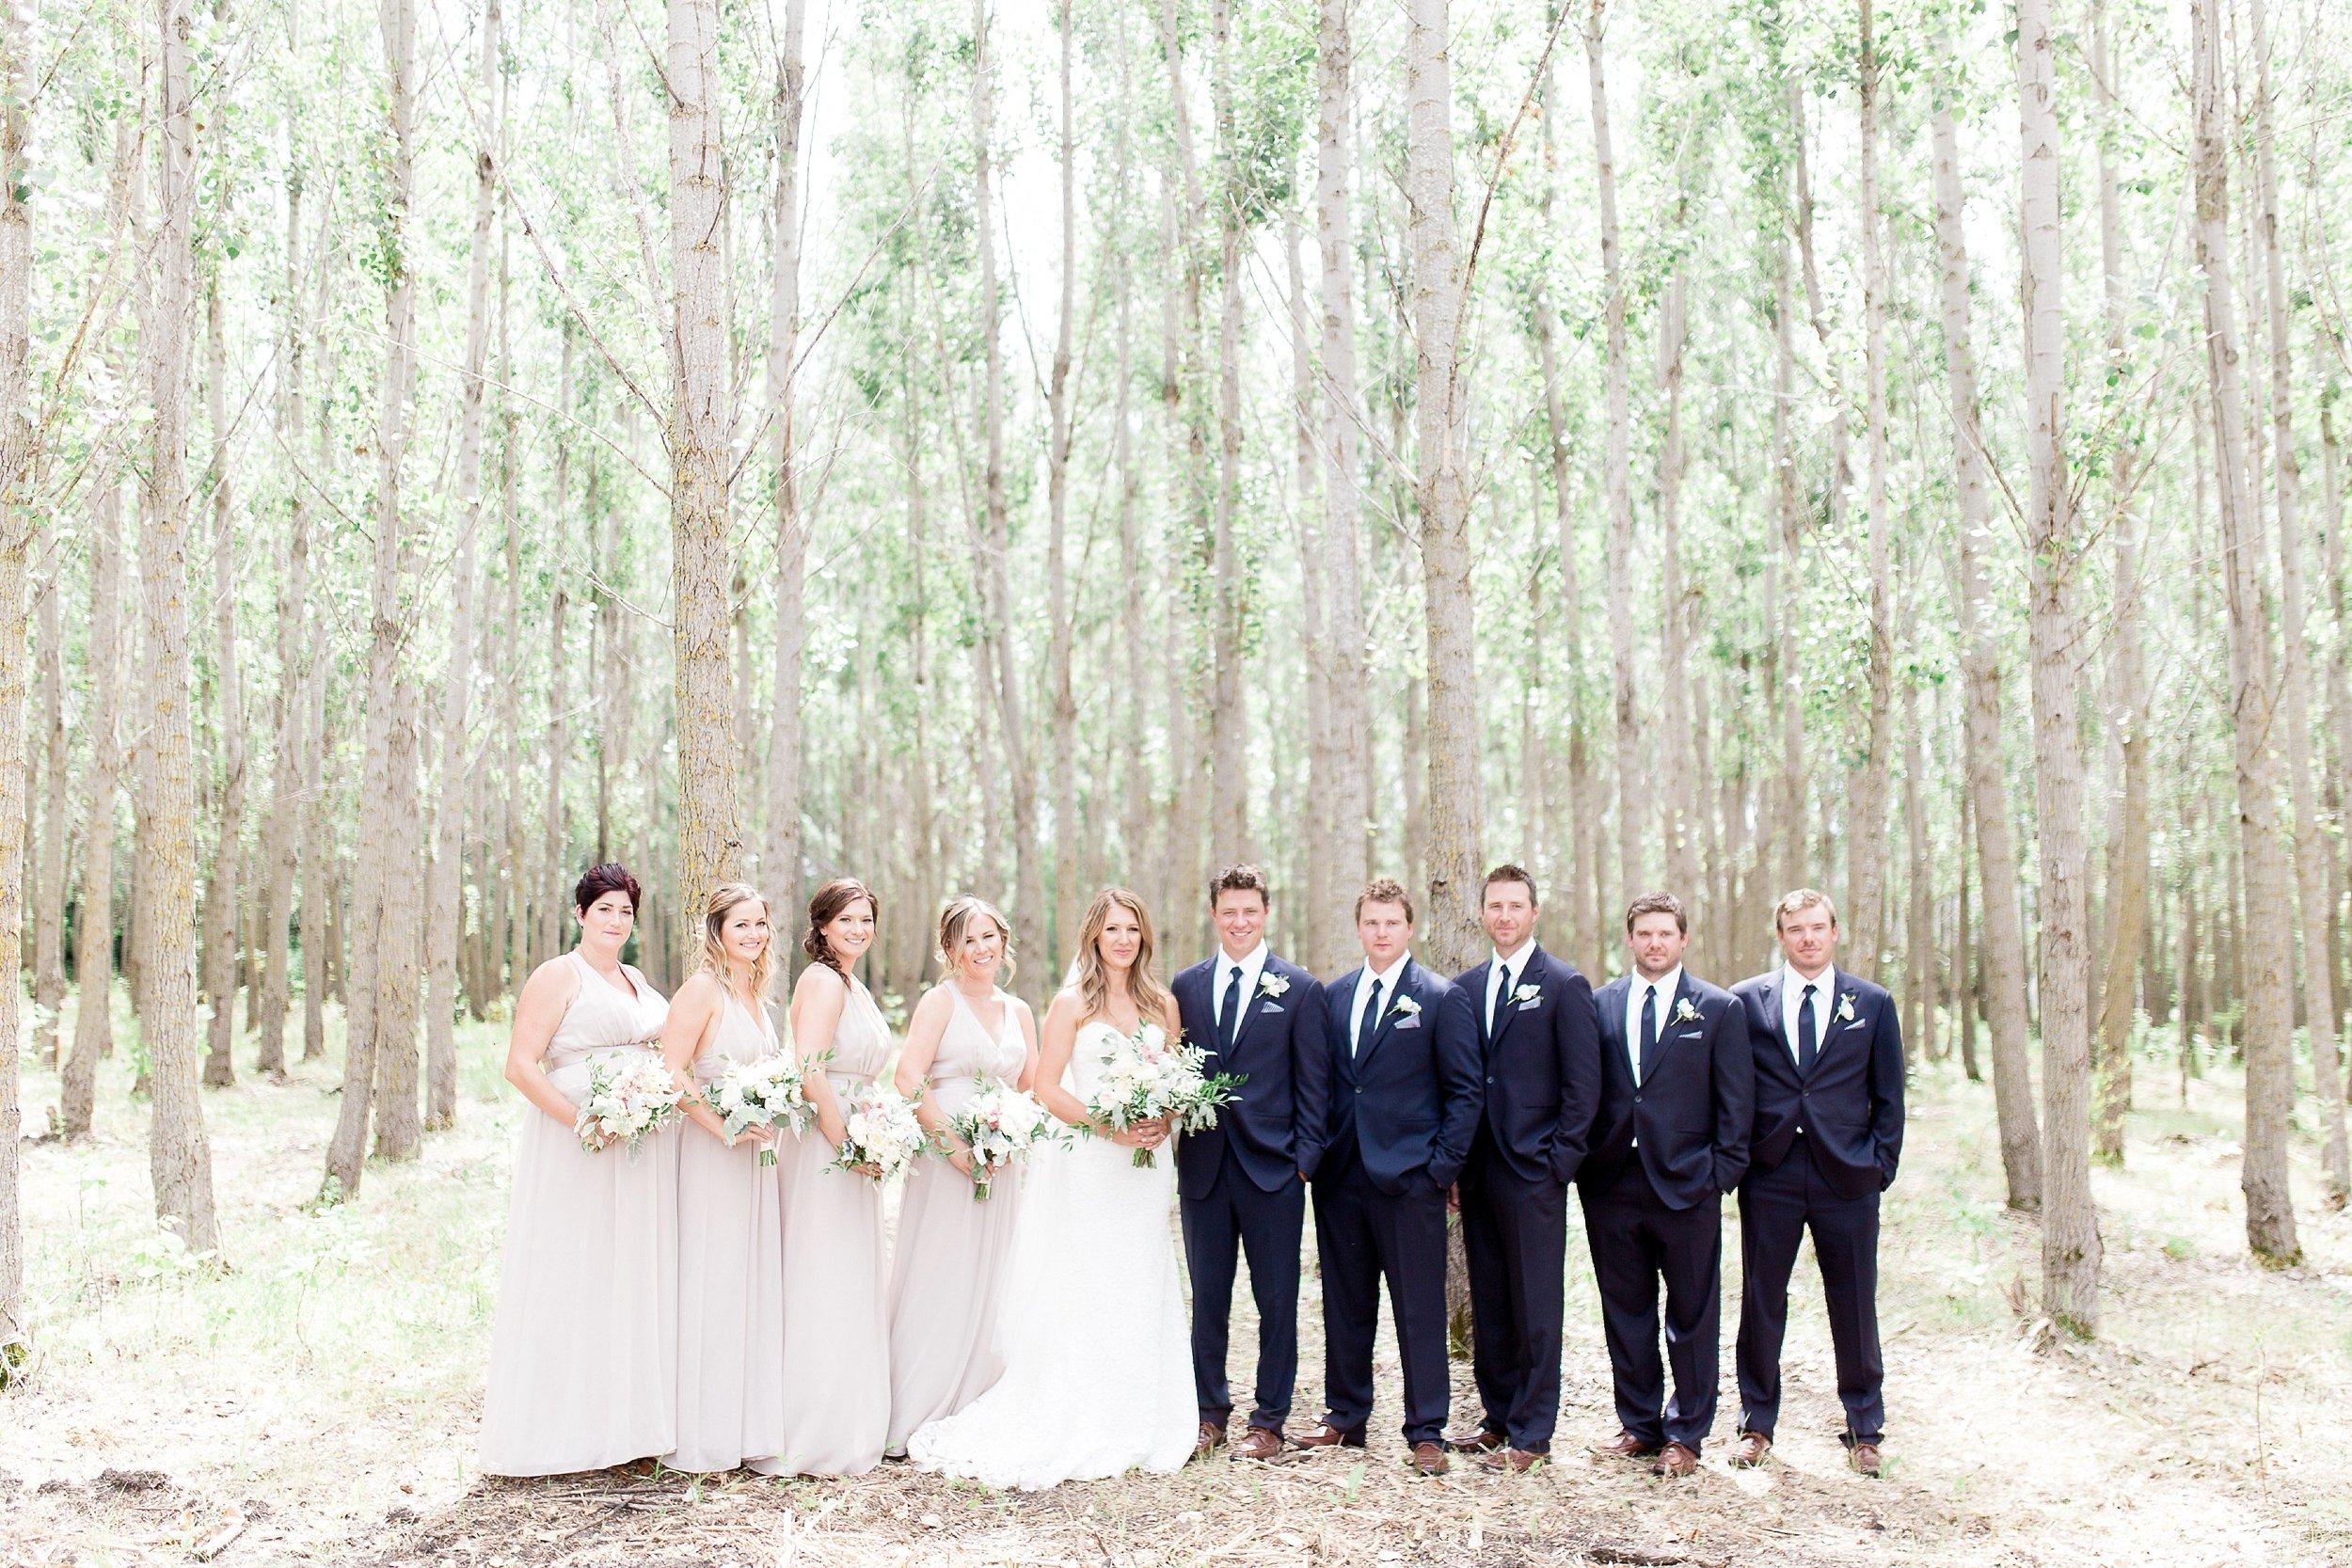 Winnipeg Wedding Photographer Keila Marie Photography   Bridal party photos  Garden inspired wedding